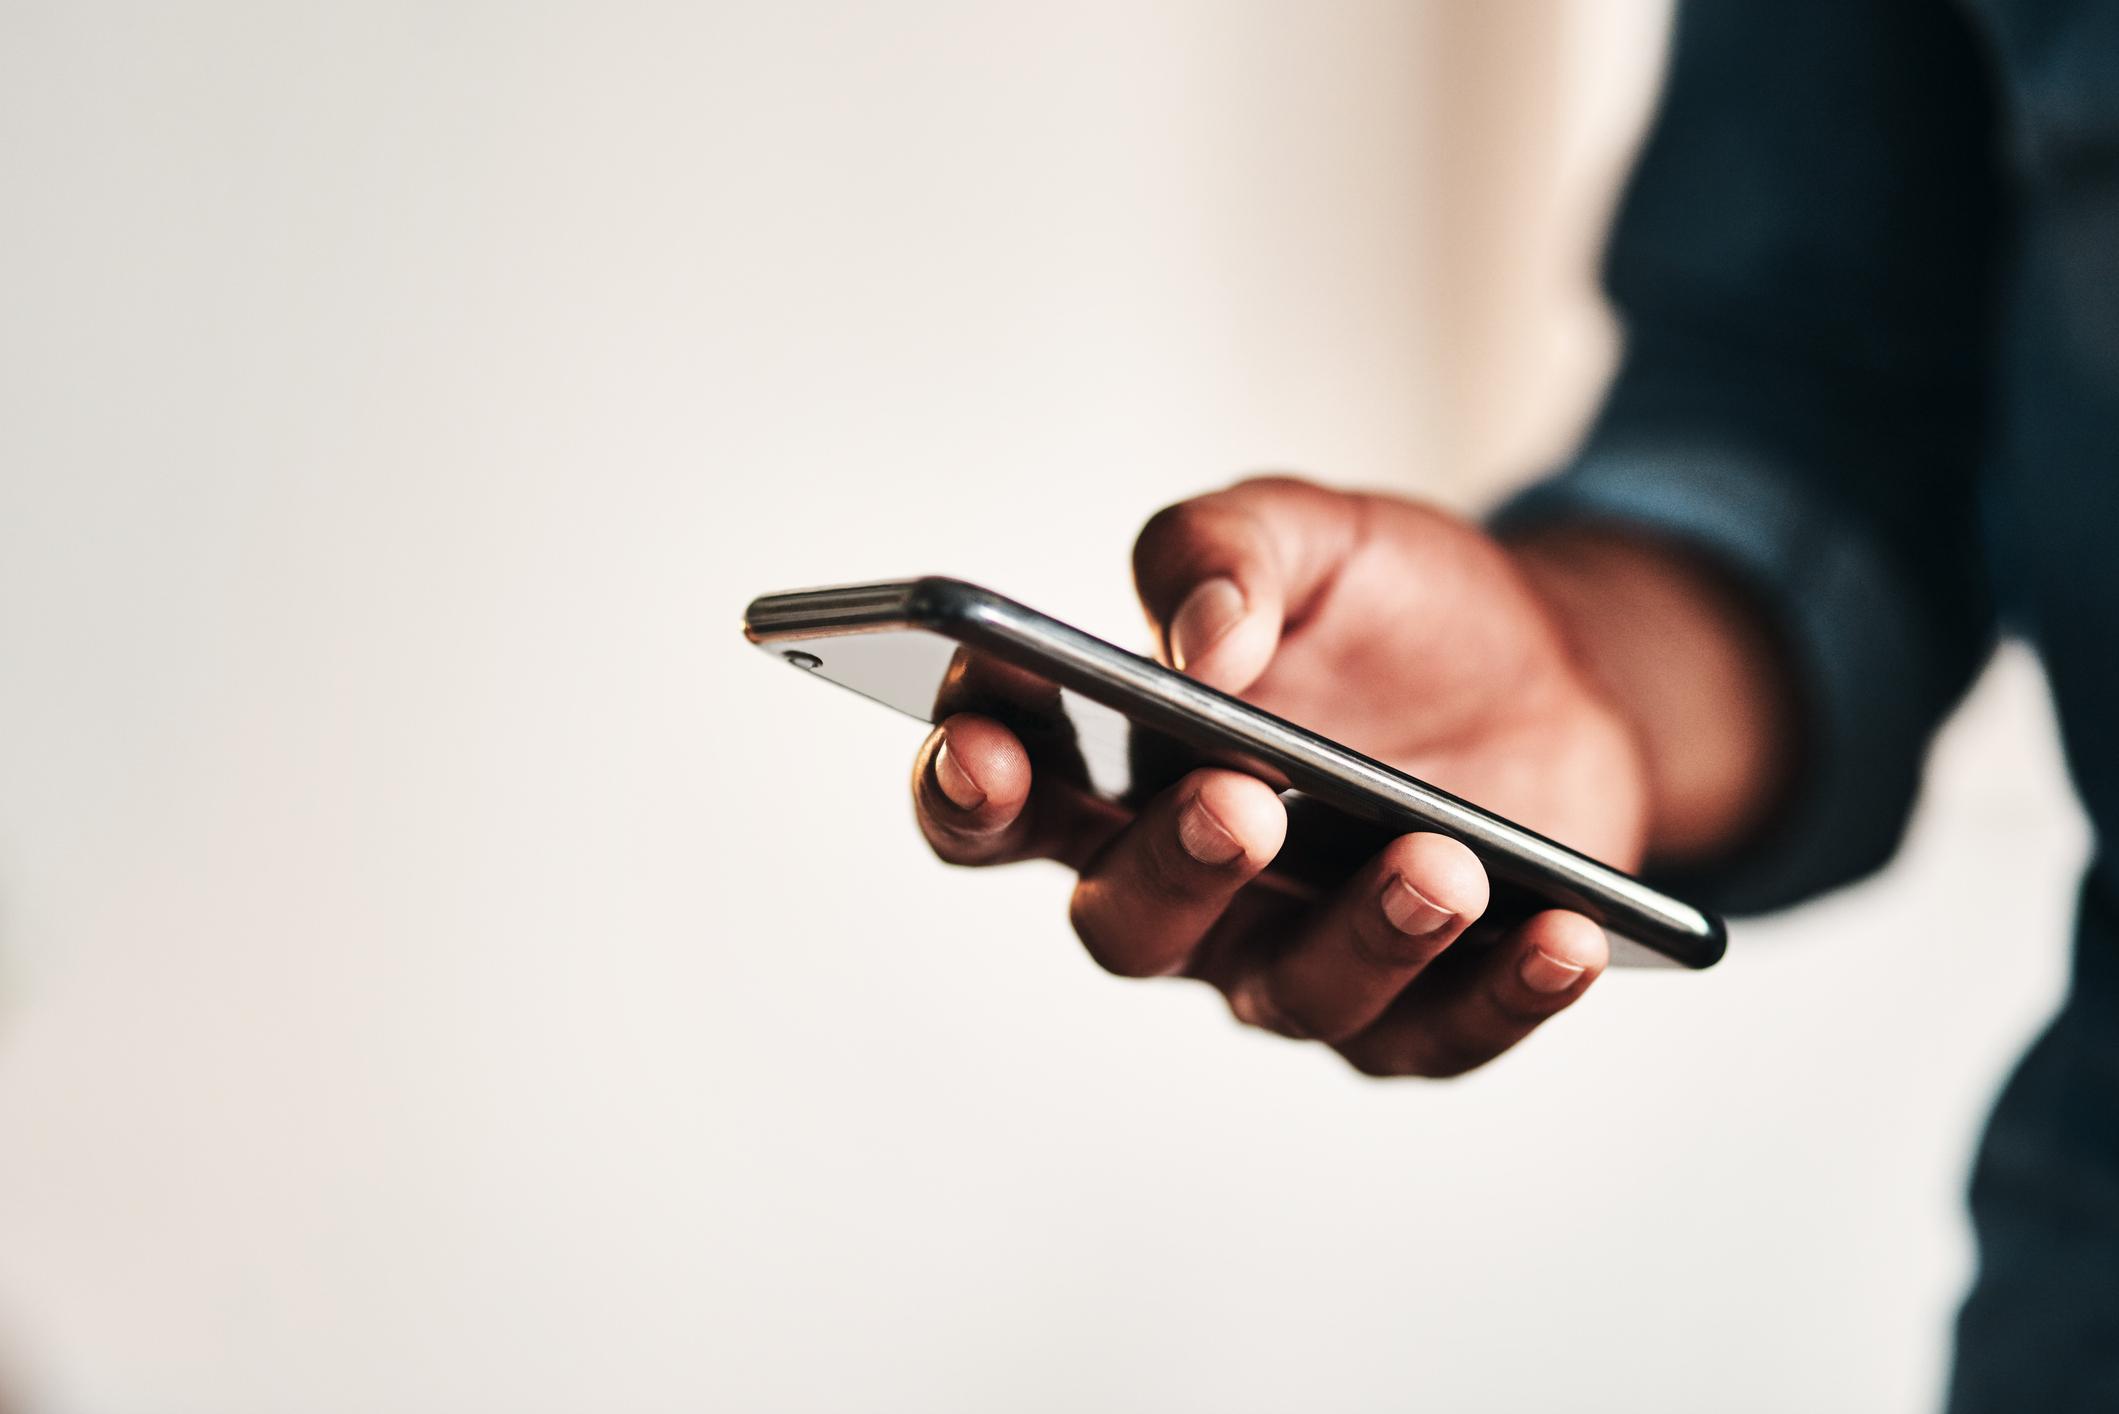 Defending against mobile threats